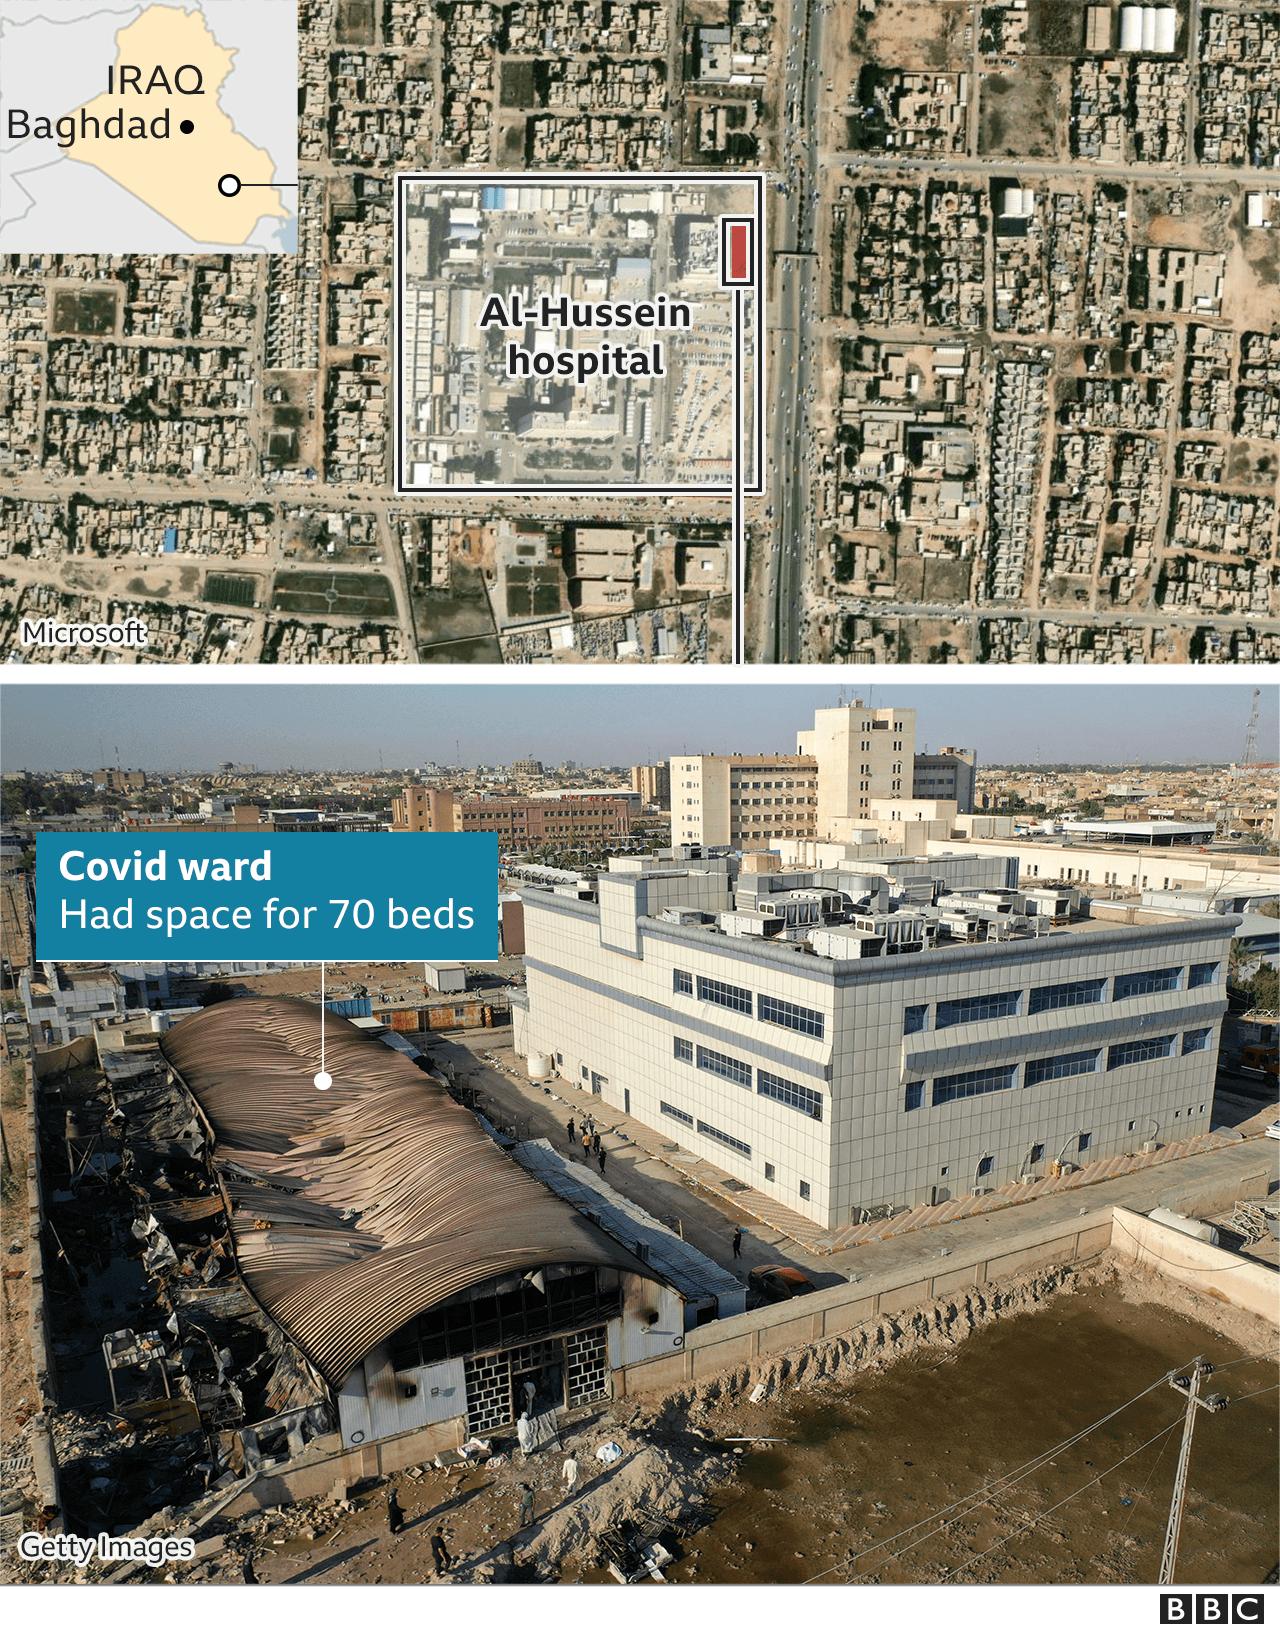 Iraq hospital annotated image